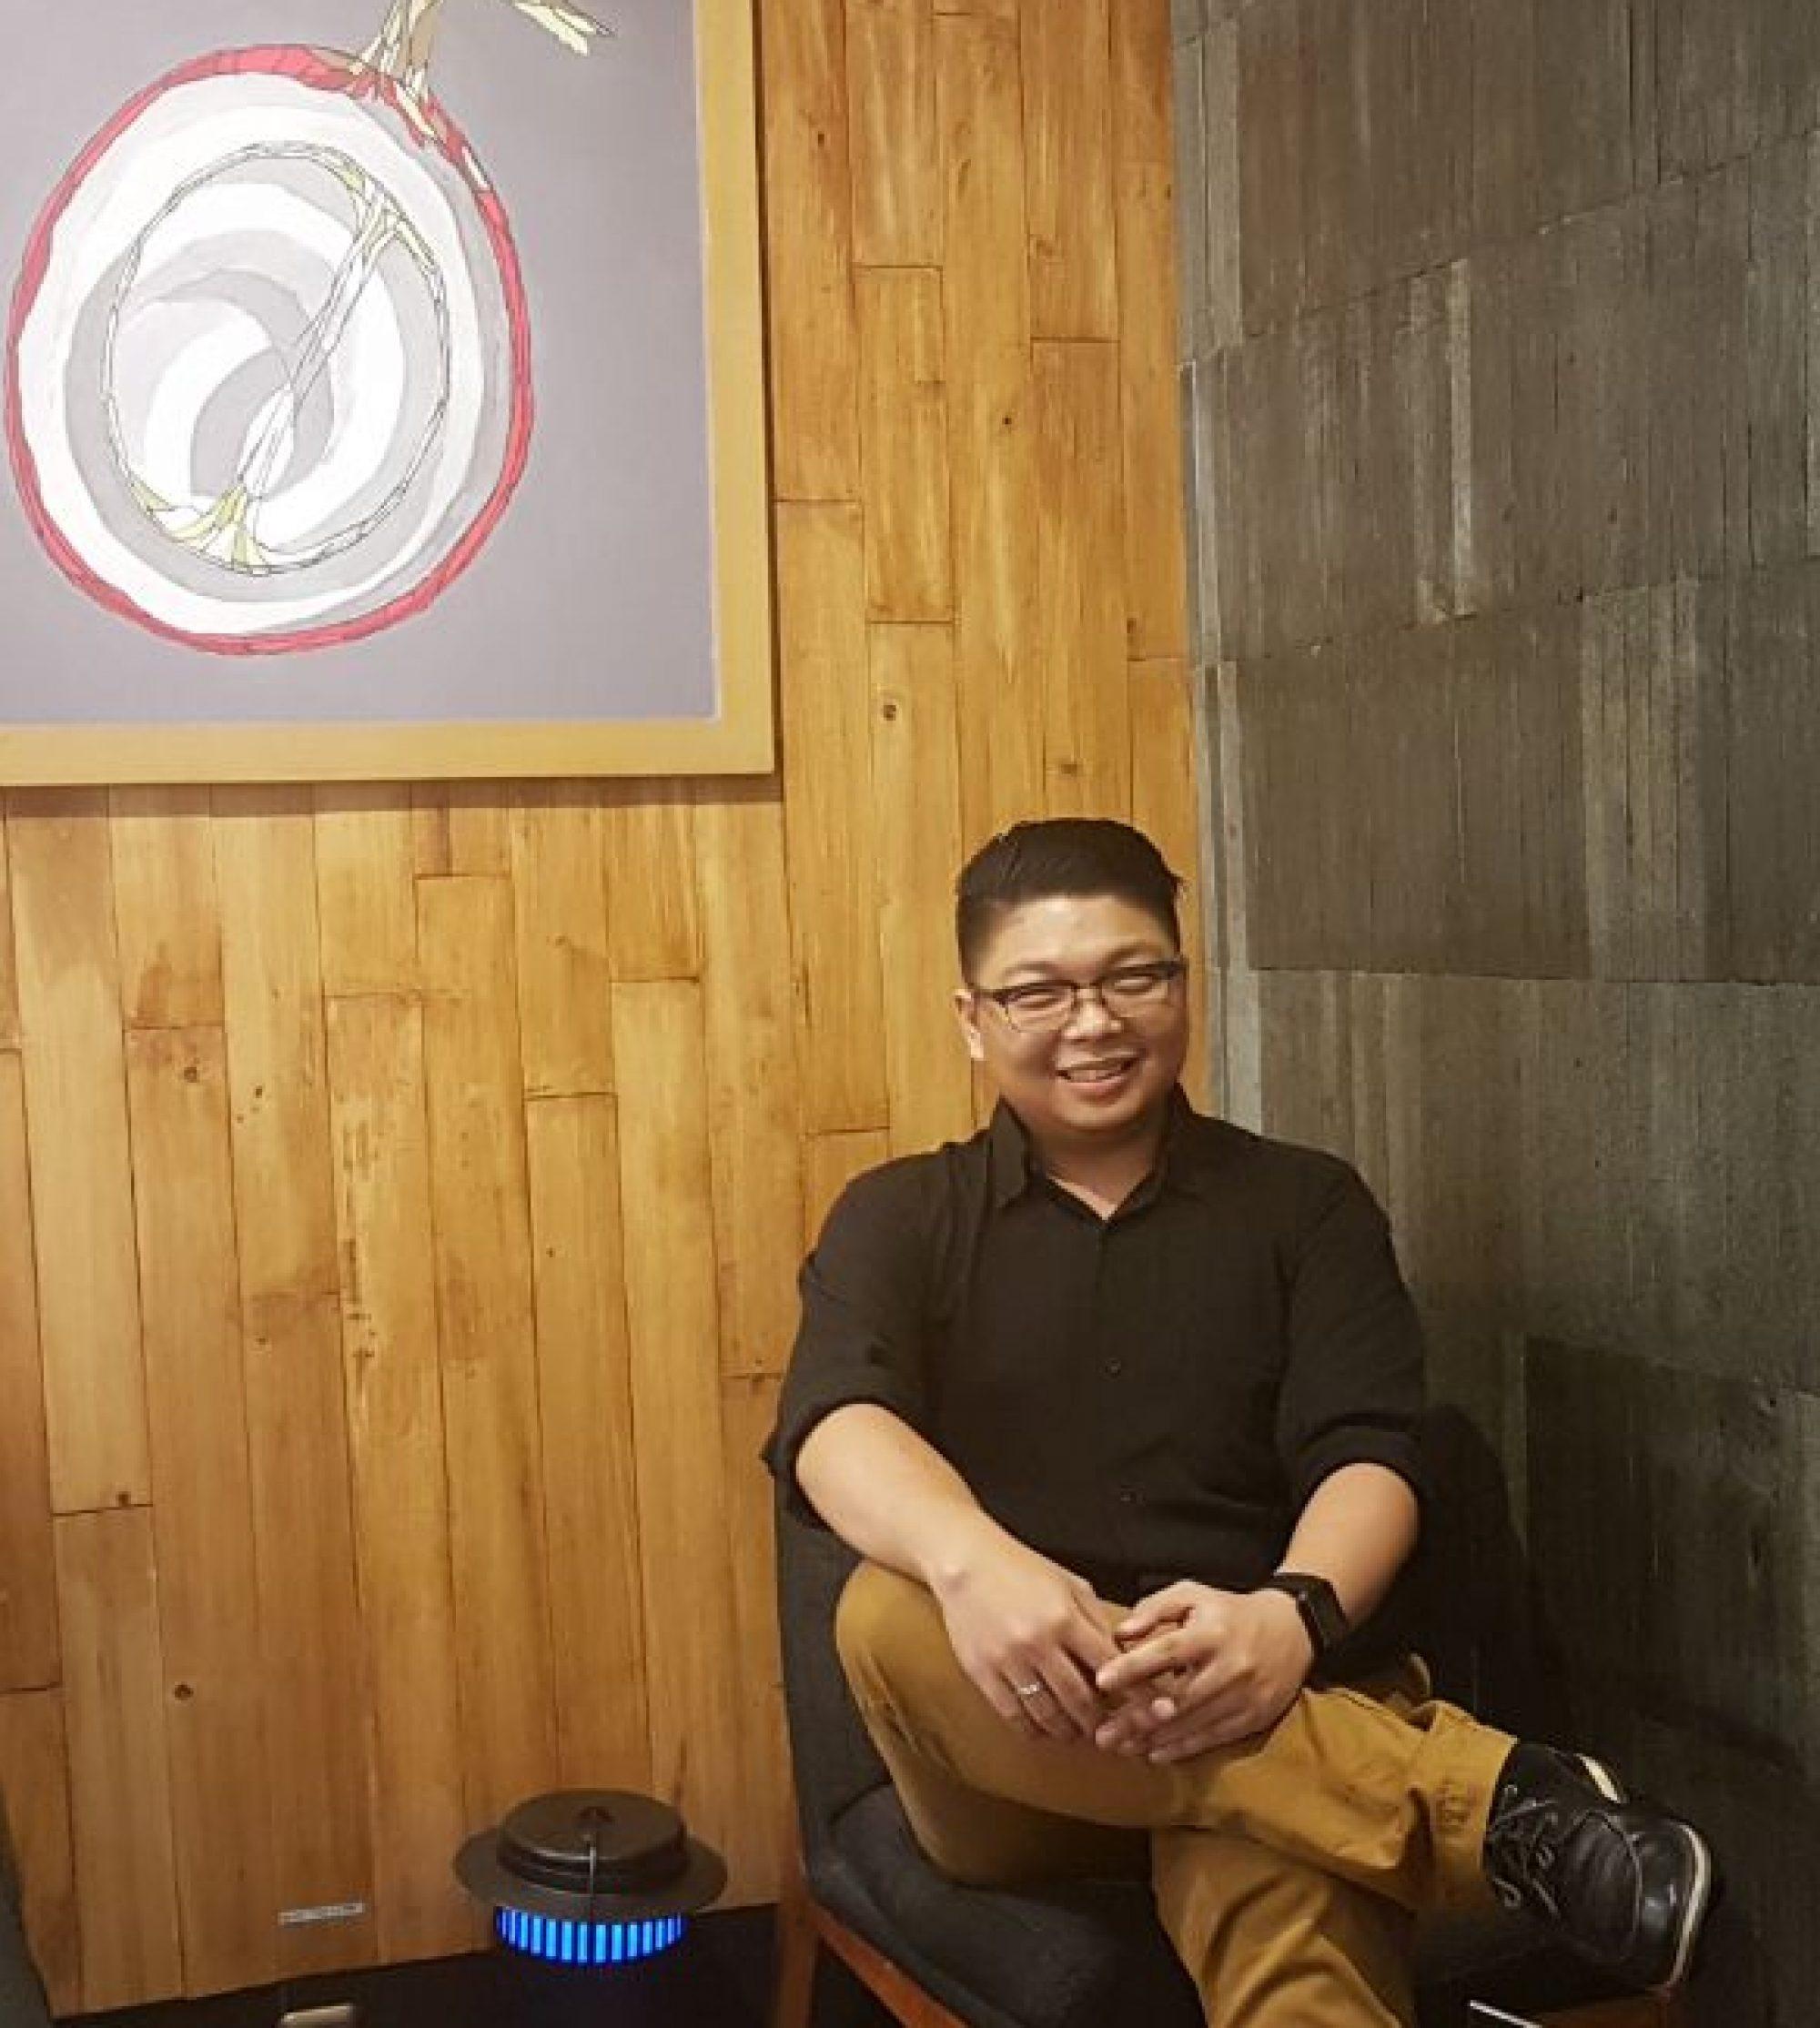 Andhika Wijaya Kurniawan